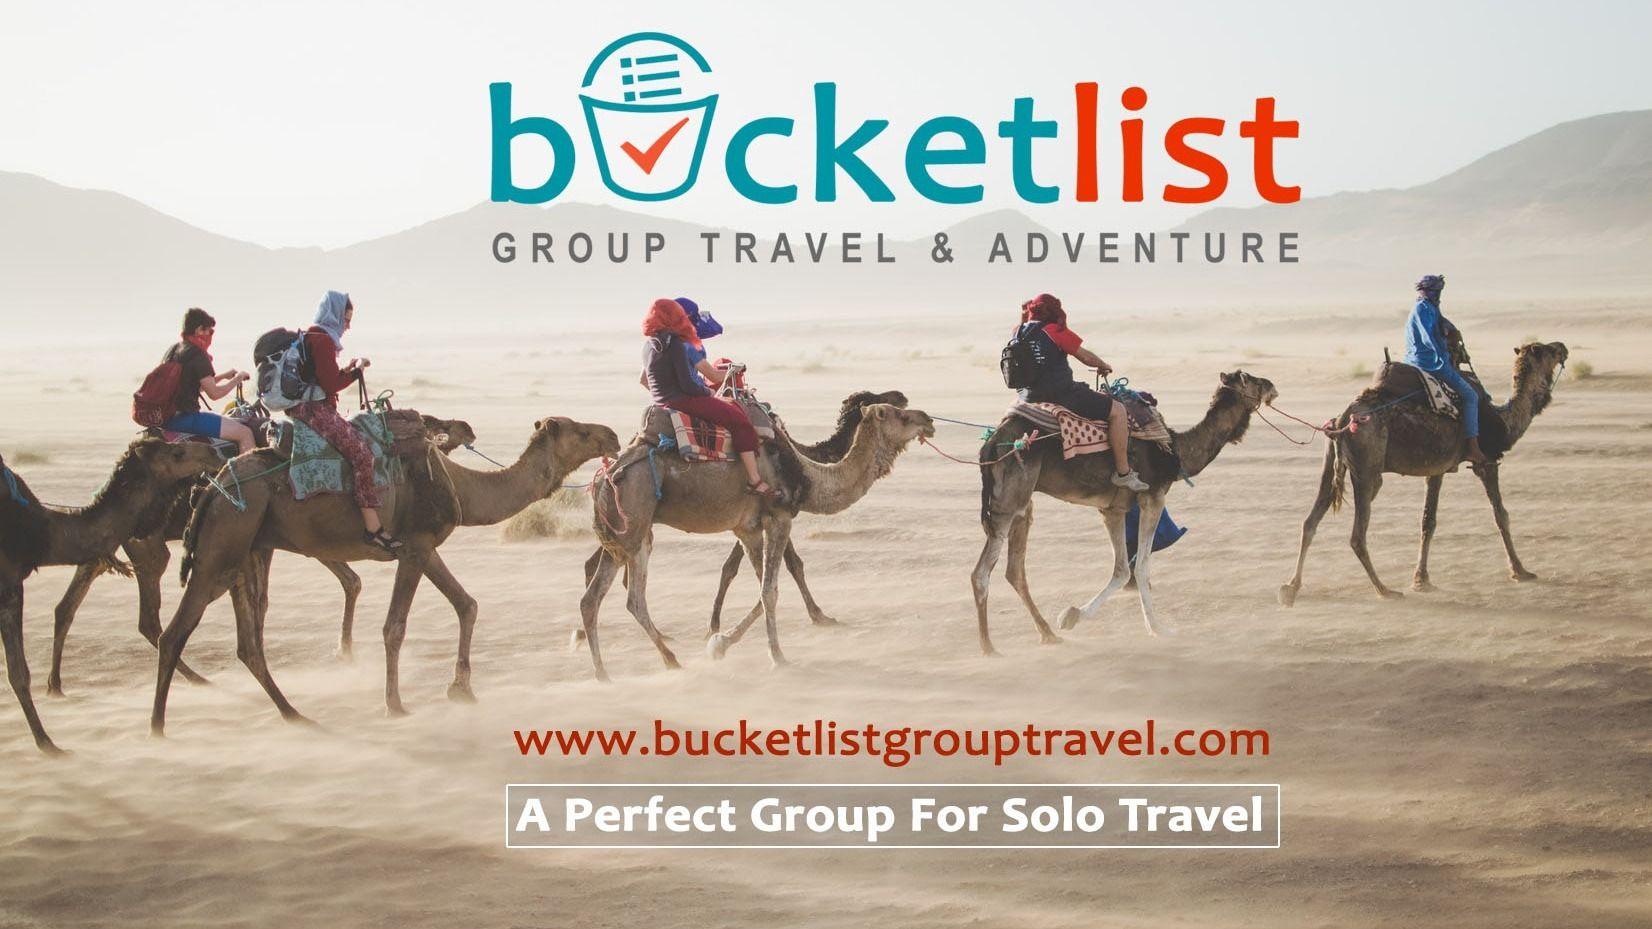 Maryland - Bucket List Group Travel